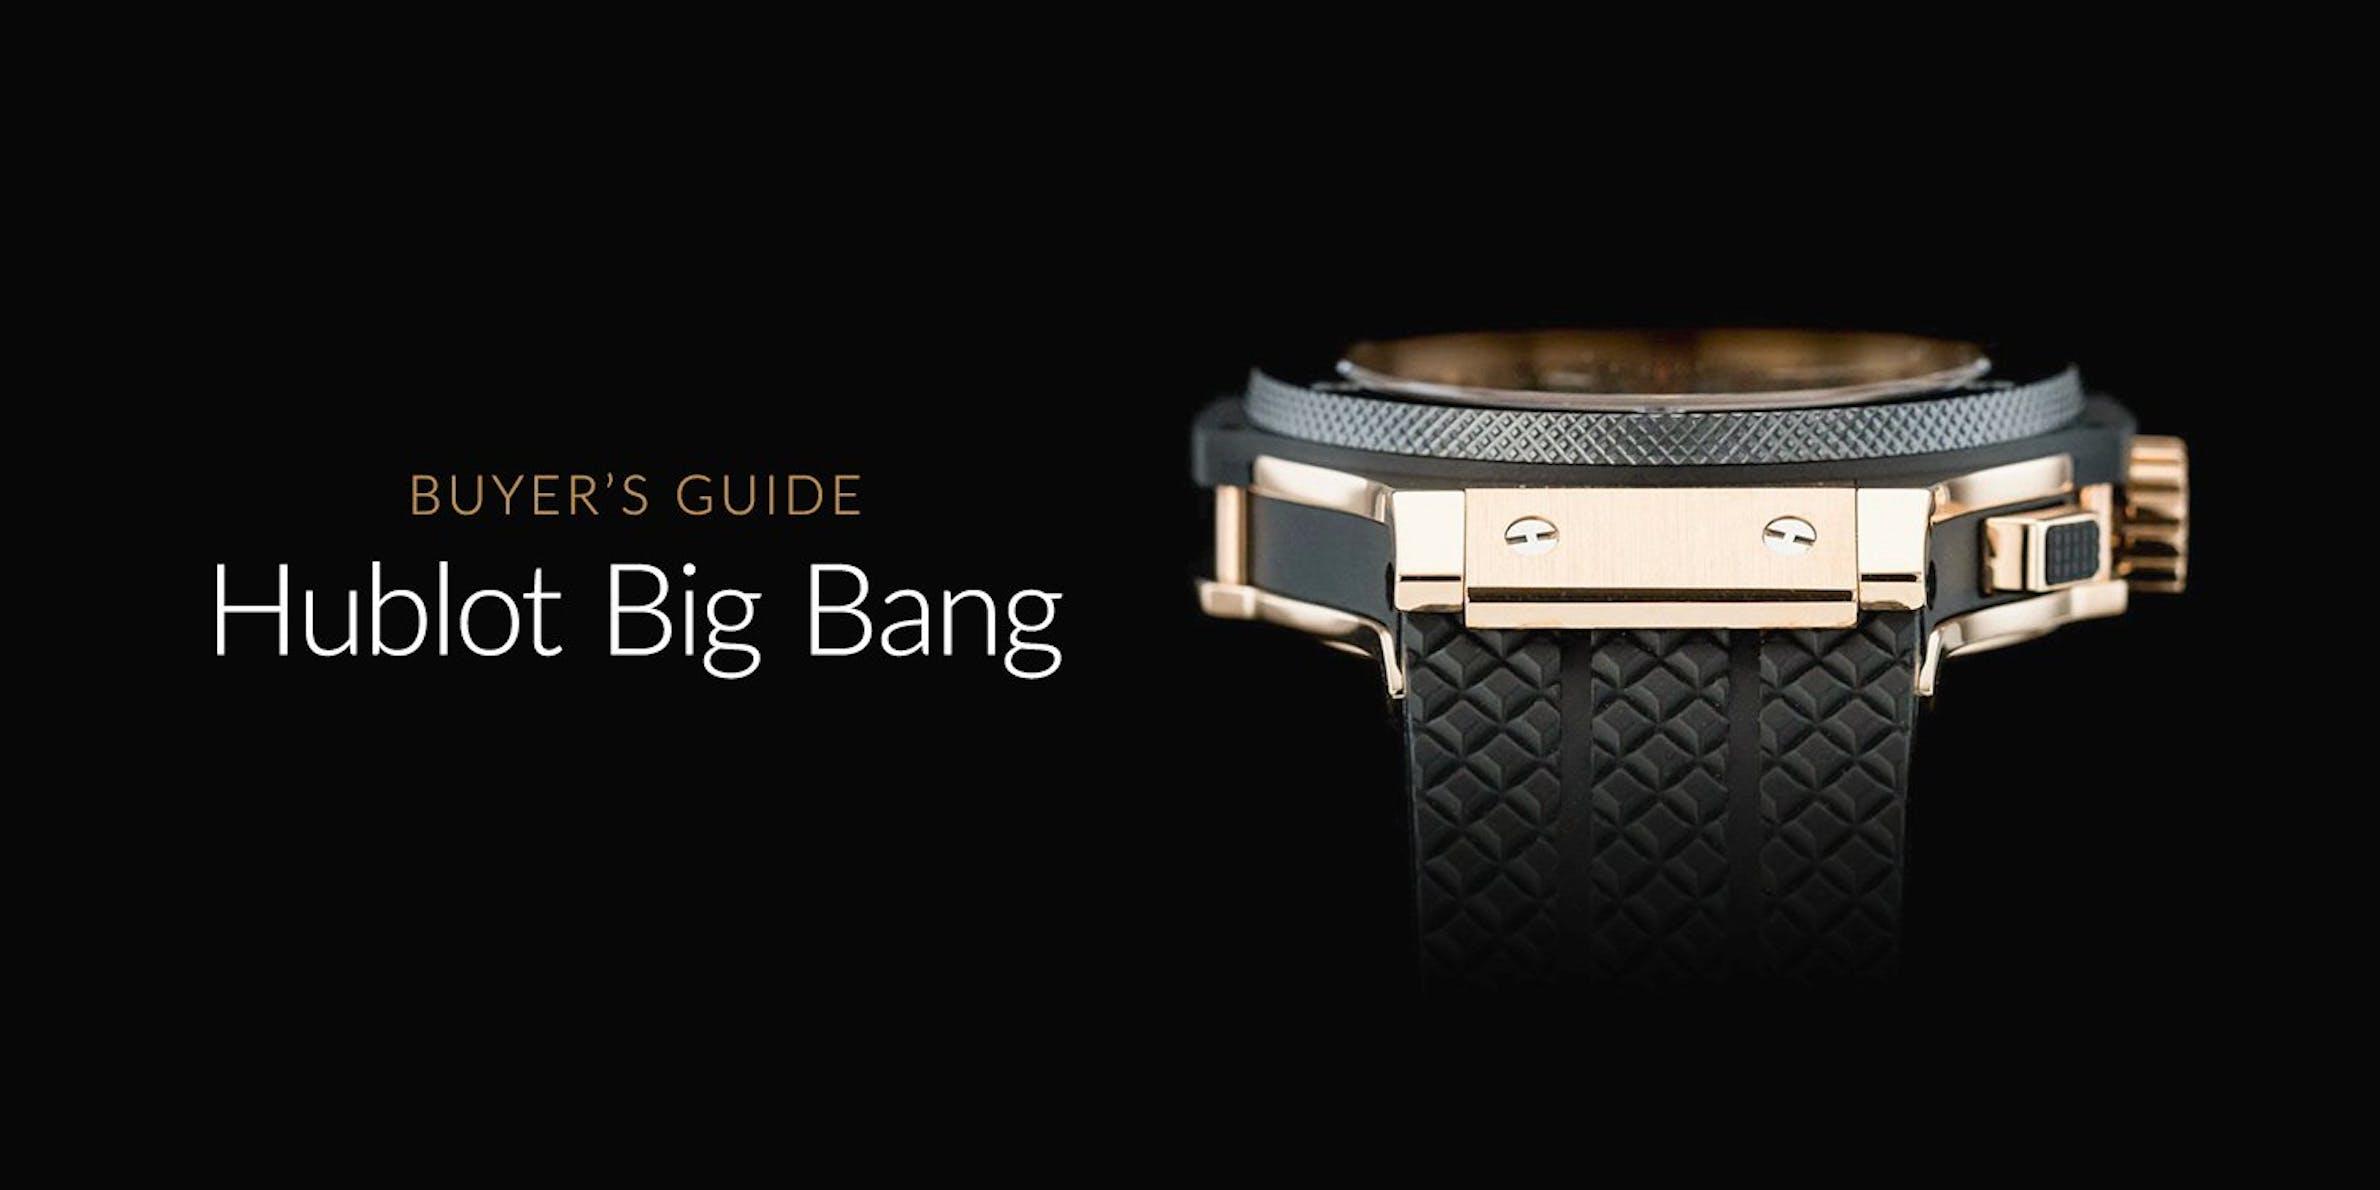 CAM-1709-Buyers-Guide-Hublot-Big-Bang-2-1-EN